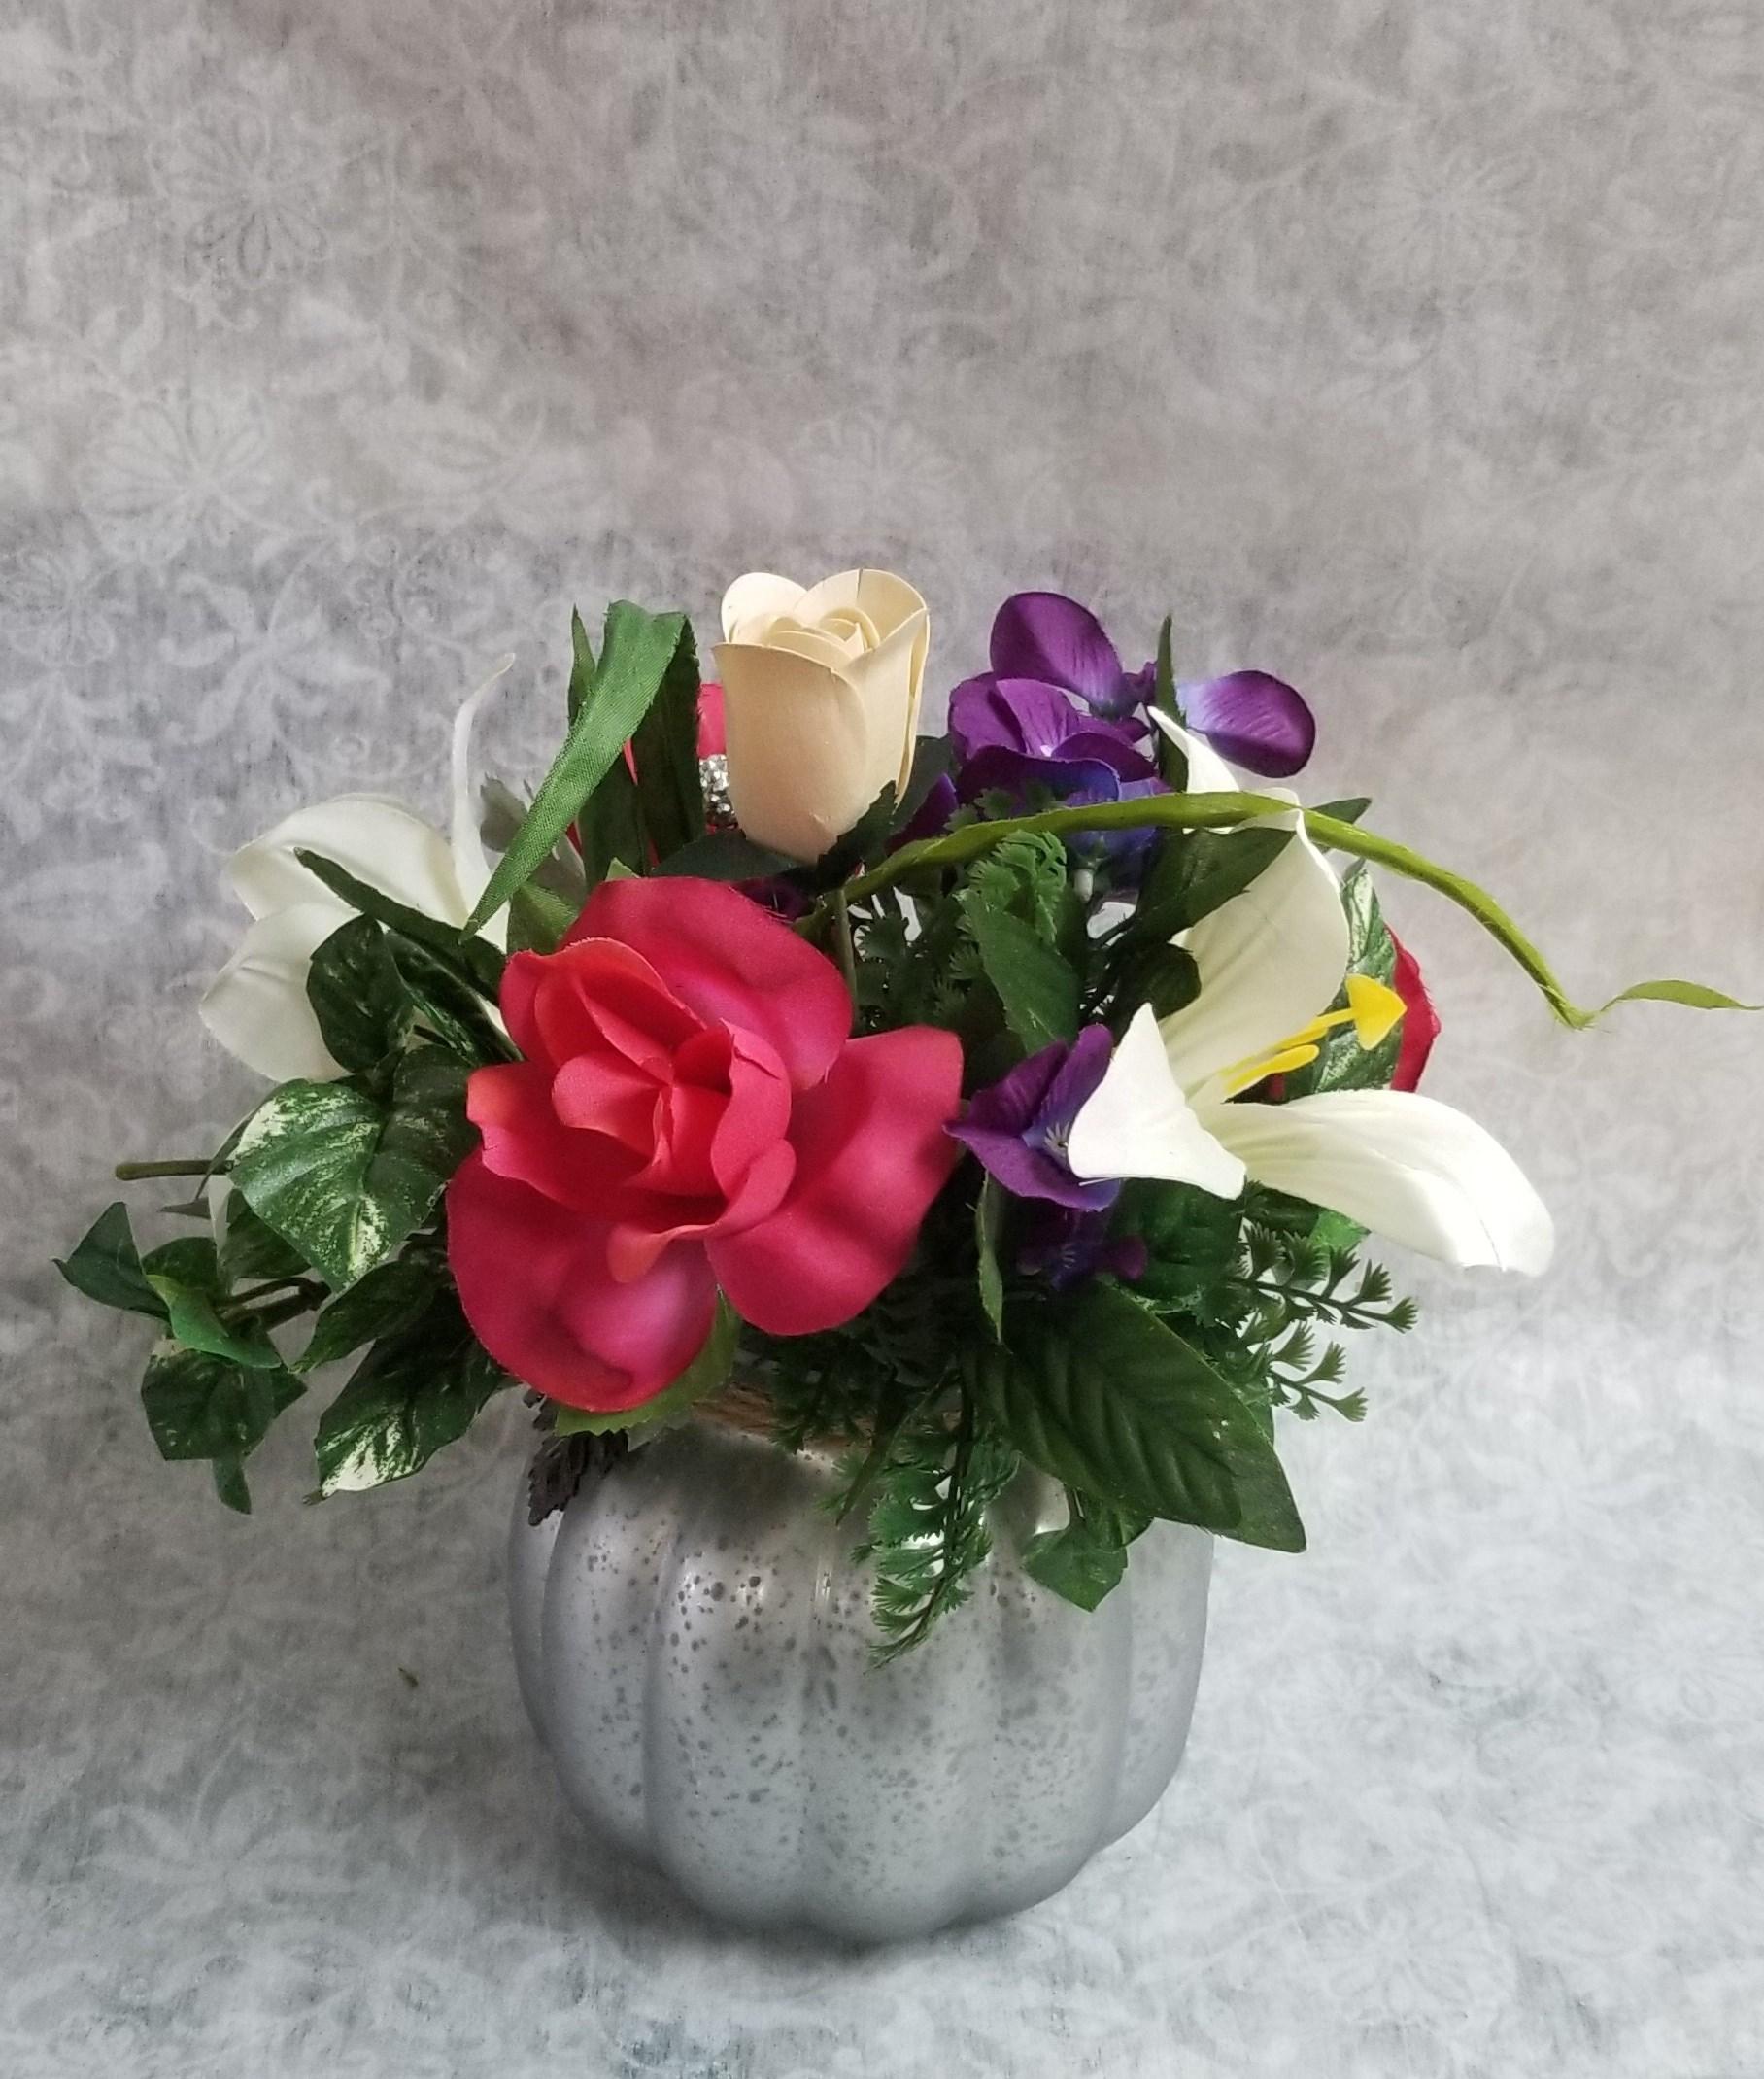 Royal Spring Tulip Bouquet Swedesboro Nj Florist